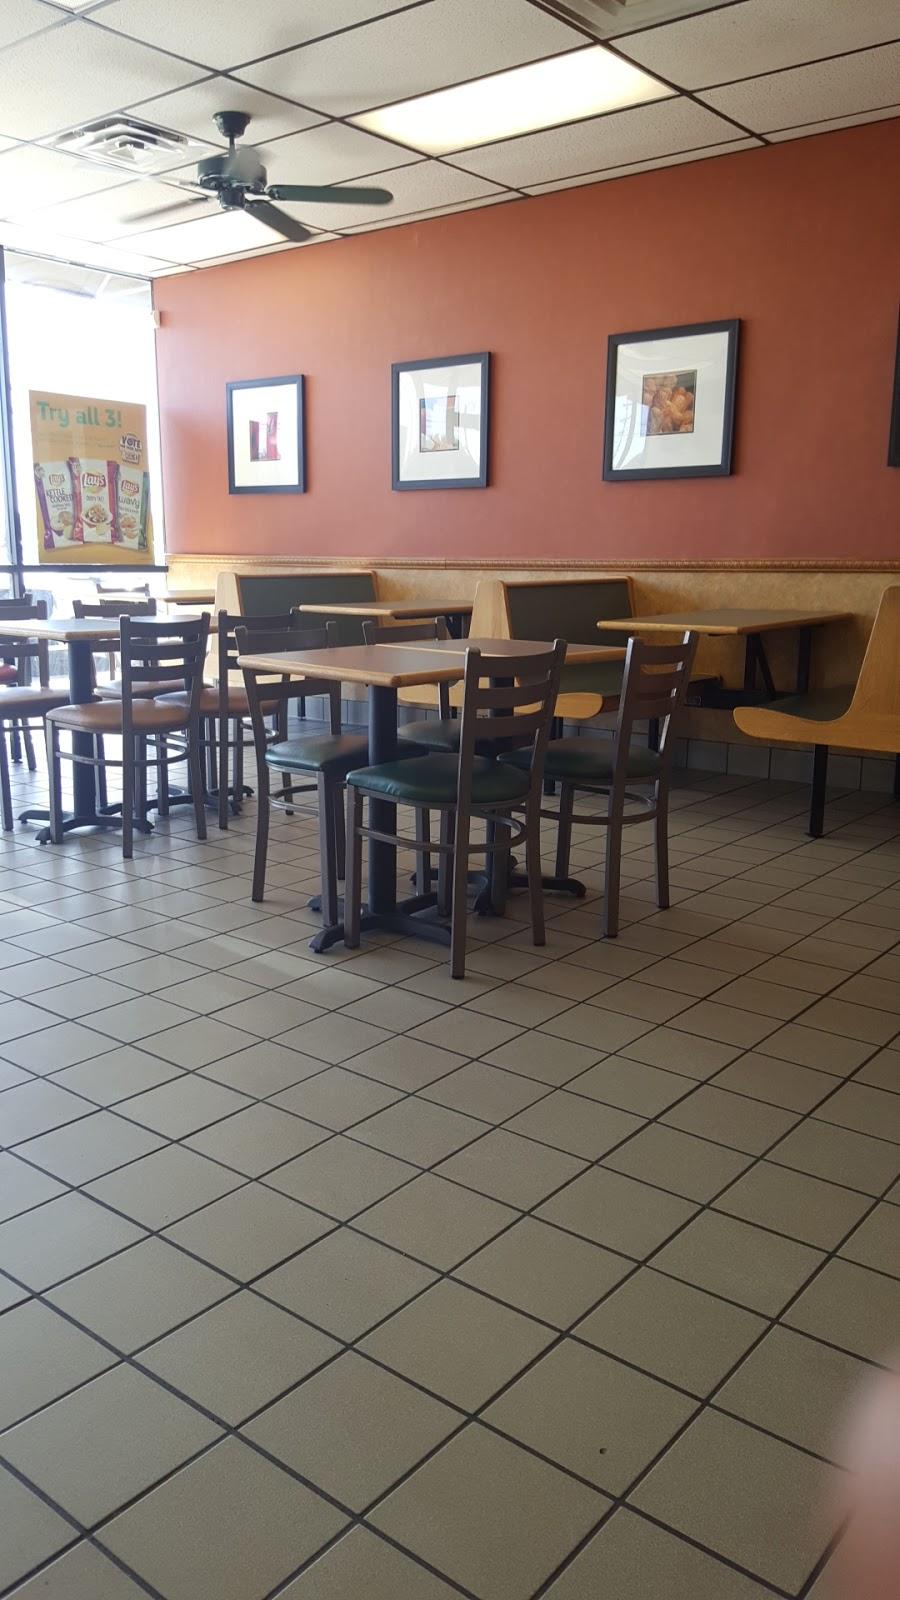 Subway Restaurants - restaurant    Photo 4 of 10   Address: 109 W Ovilla Rd, Red Oak, TX 75154, USA   Phone: (972) 230-7850